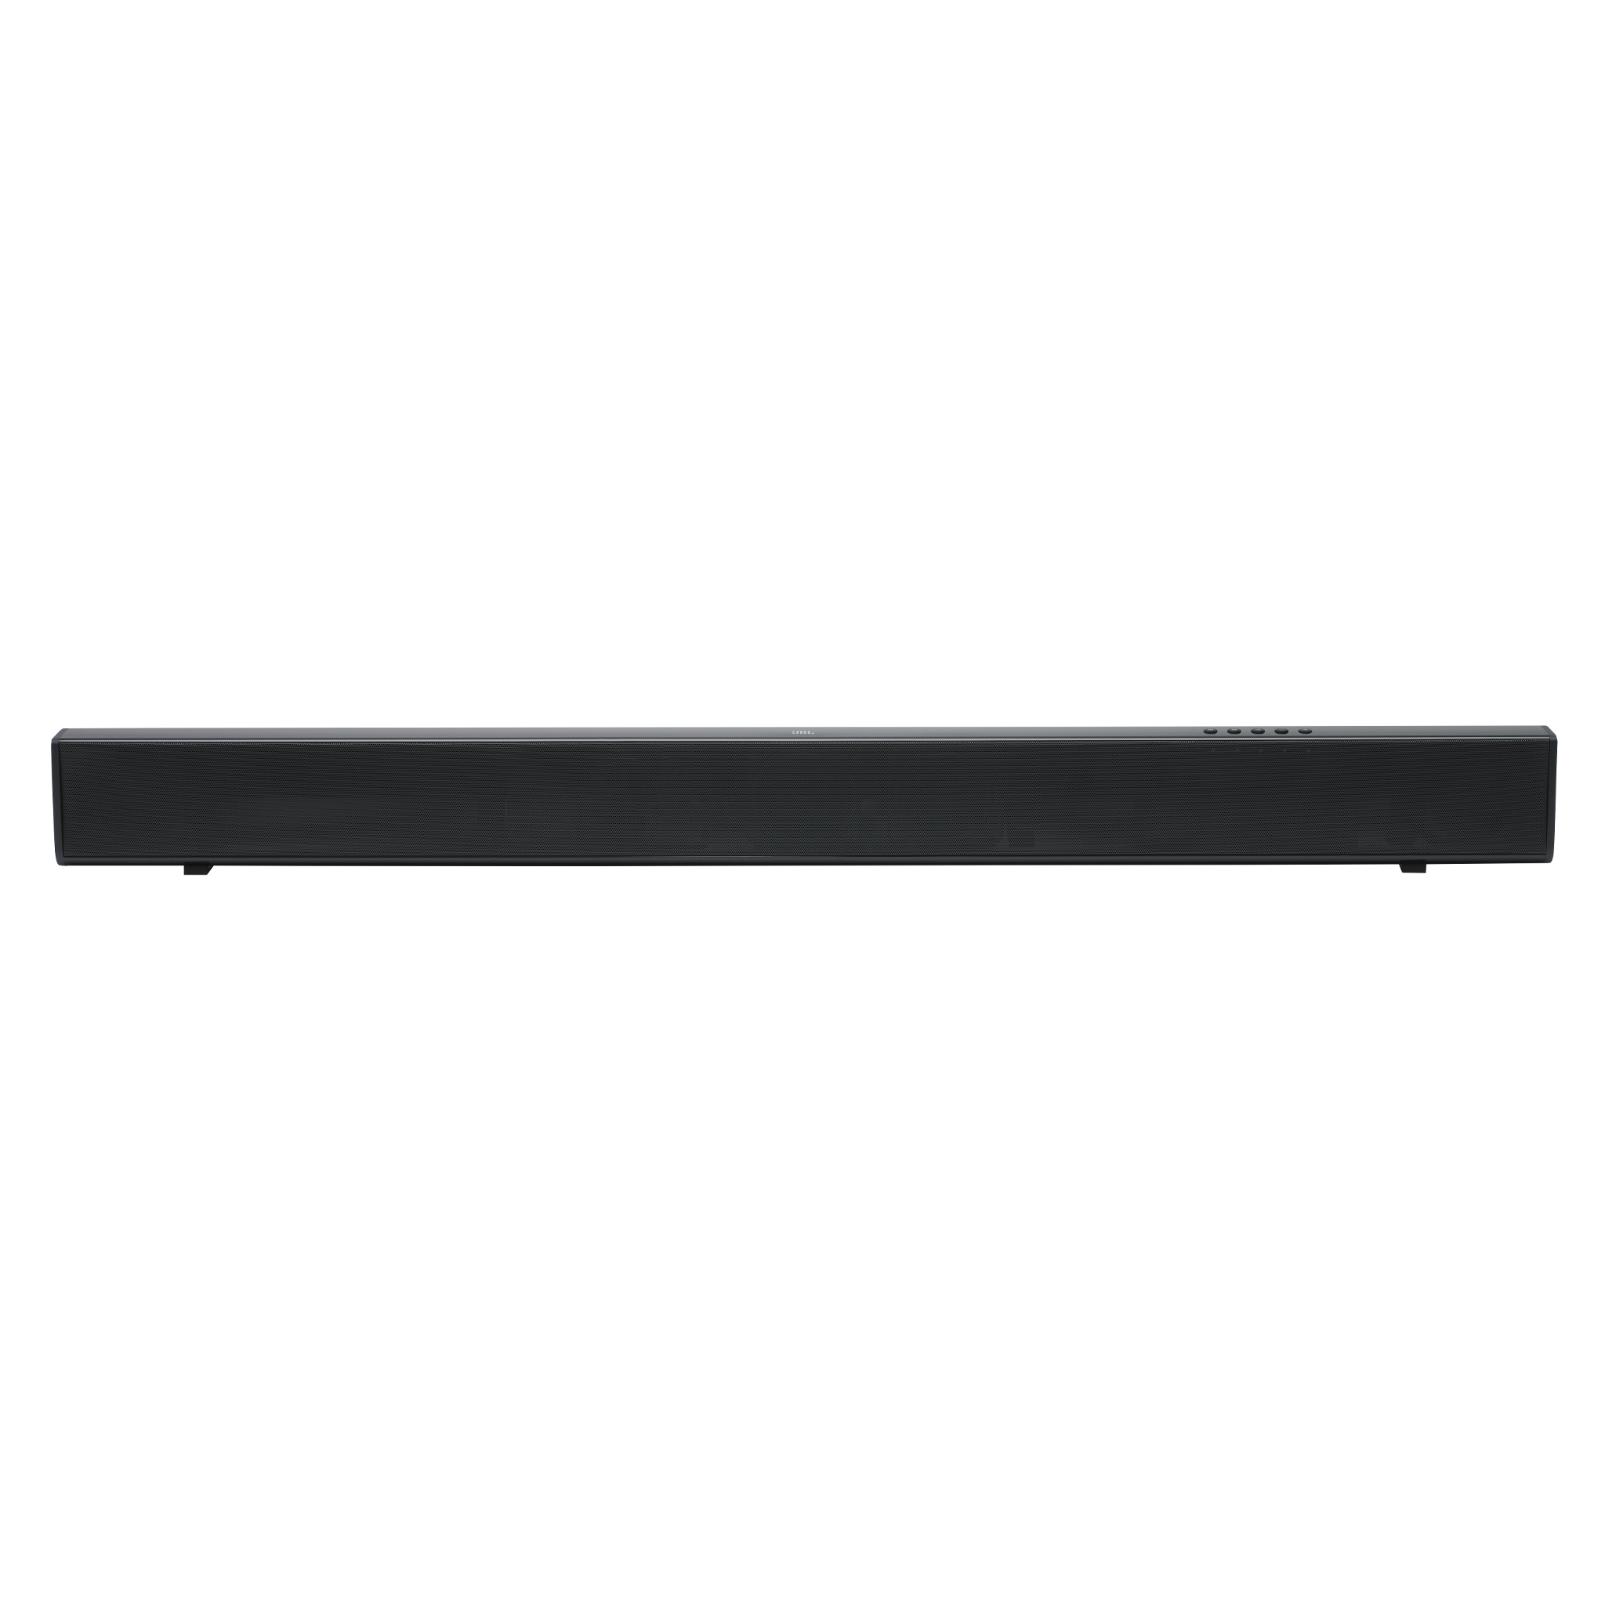 JBL Cinema SB110 - Black - 2.0 channel soundbar - Hero